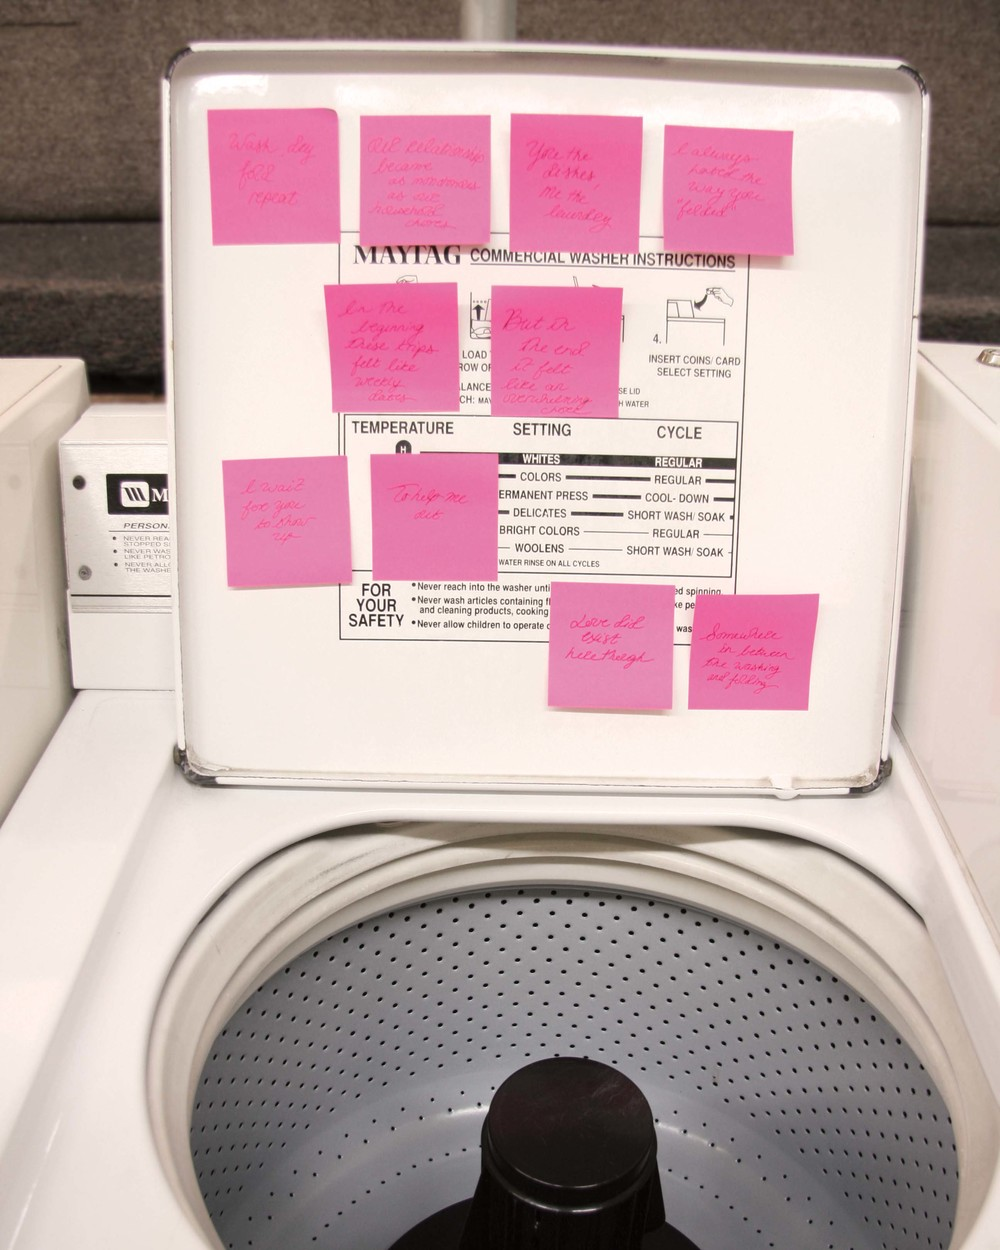 Mills 50 Laundromat (Orlando, FL)